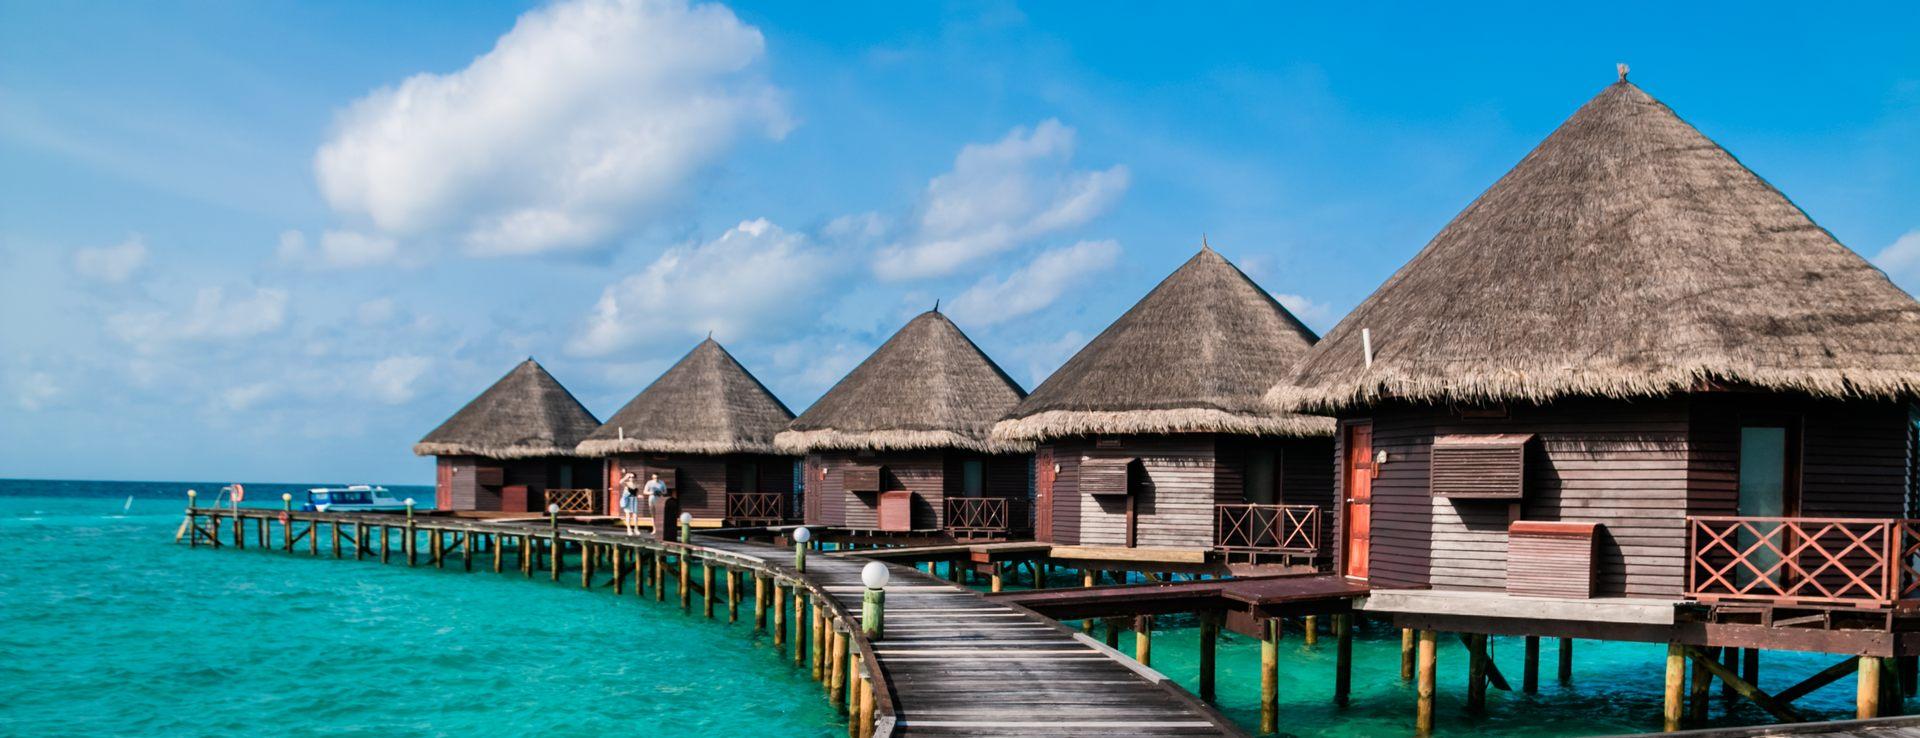 Conrad Maldives Rangali Island Image 1